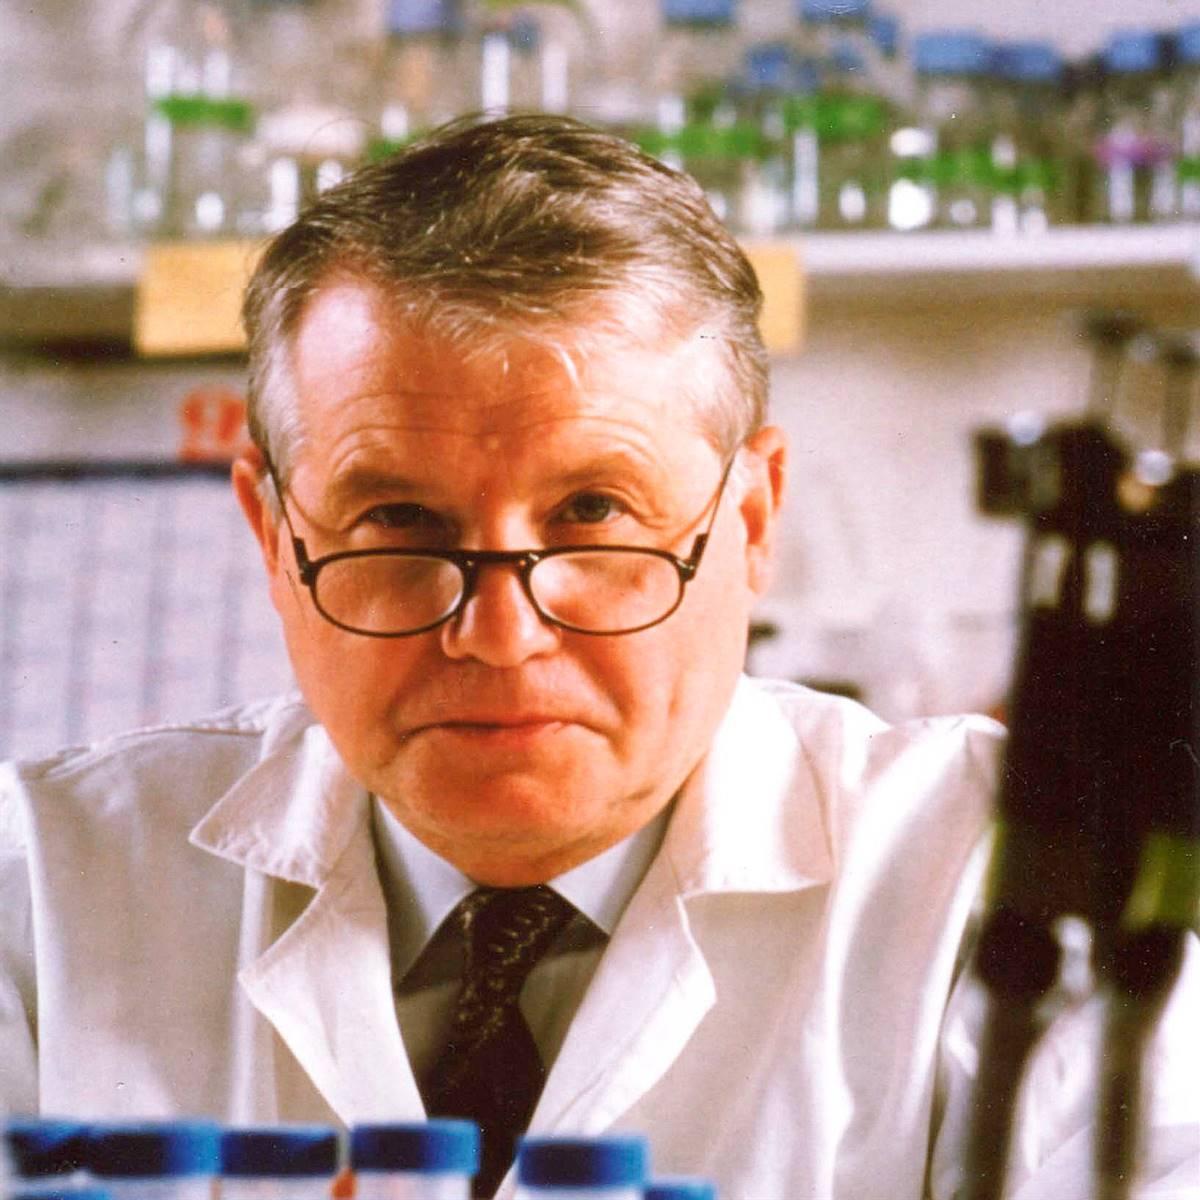 Professor Luc Montagnier